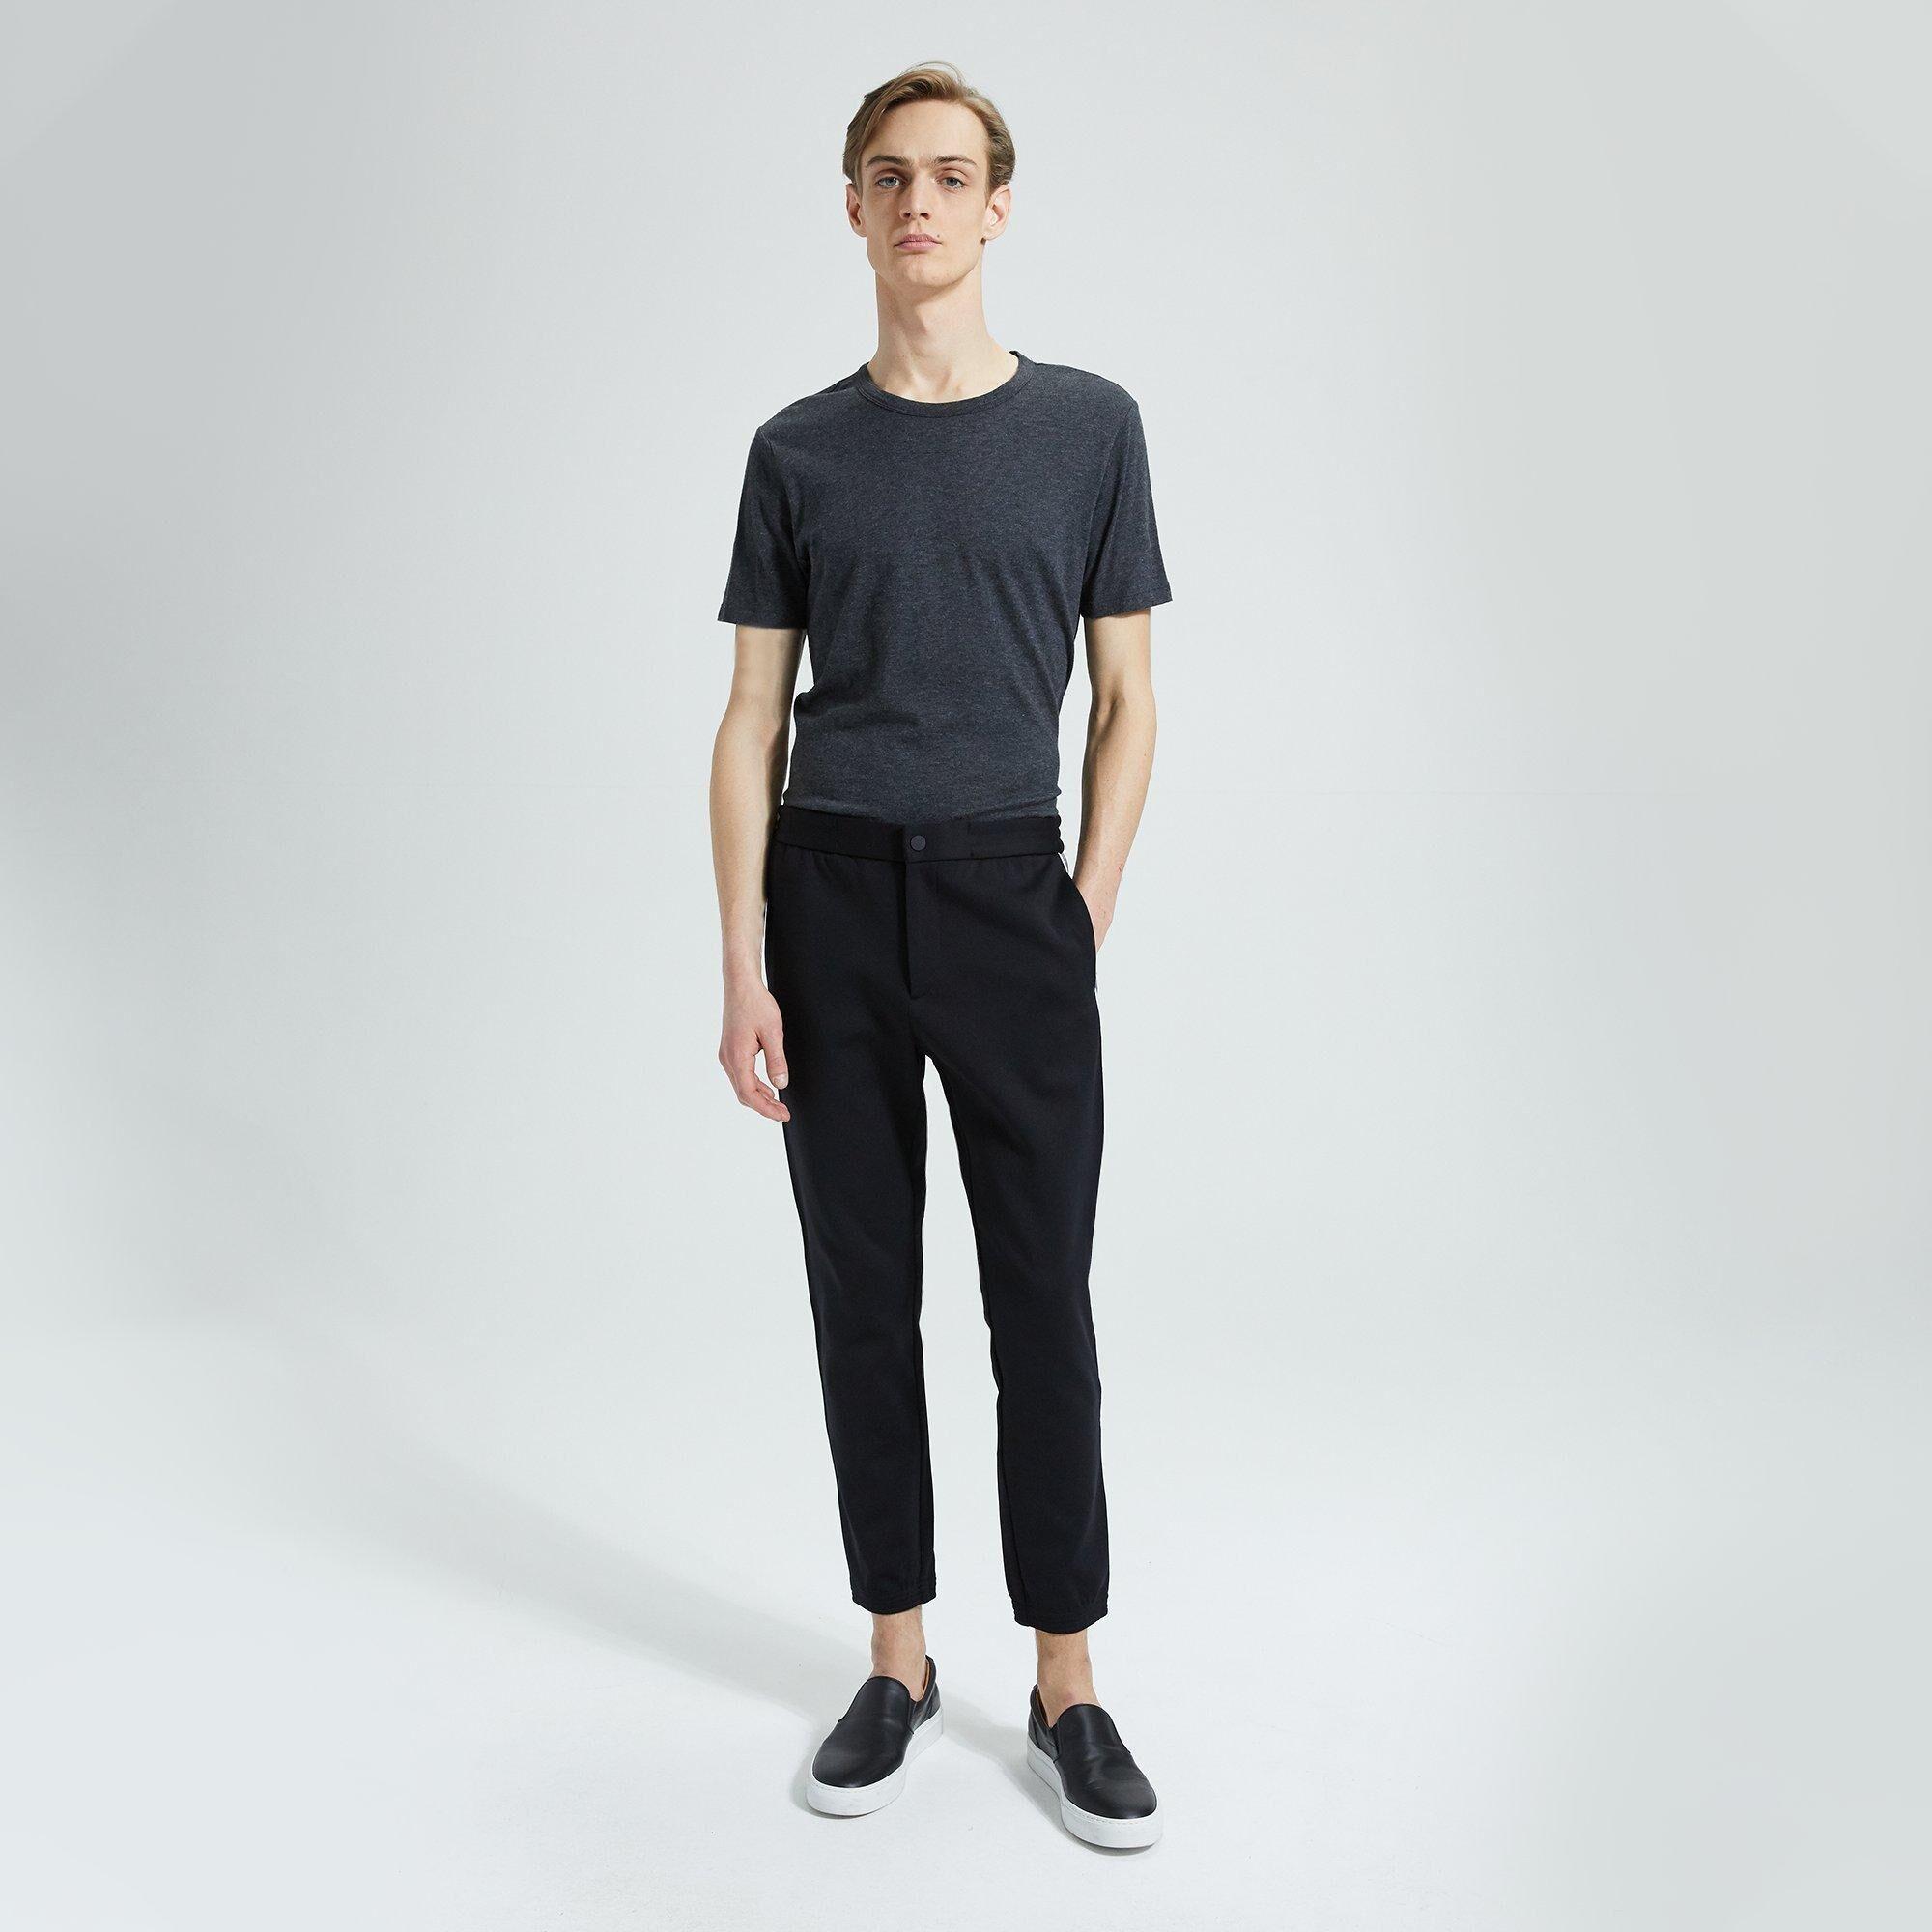 Theory Tech Face Ponte Terrance Pant  - BLACK - male - Size: 2X-Large